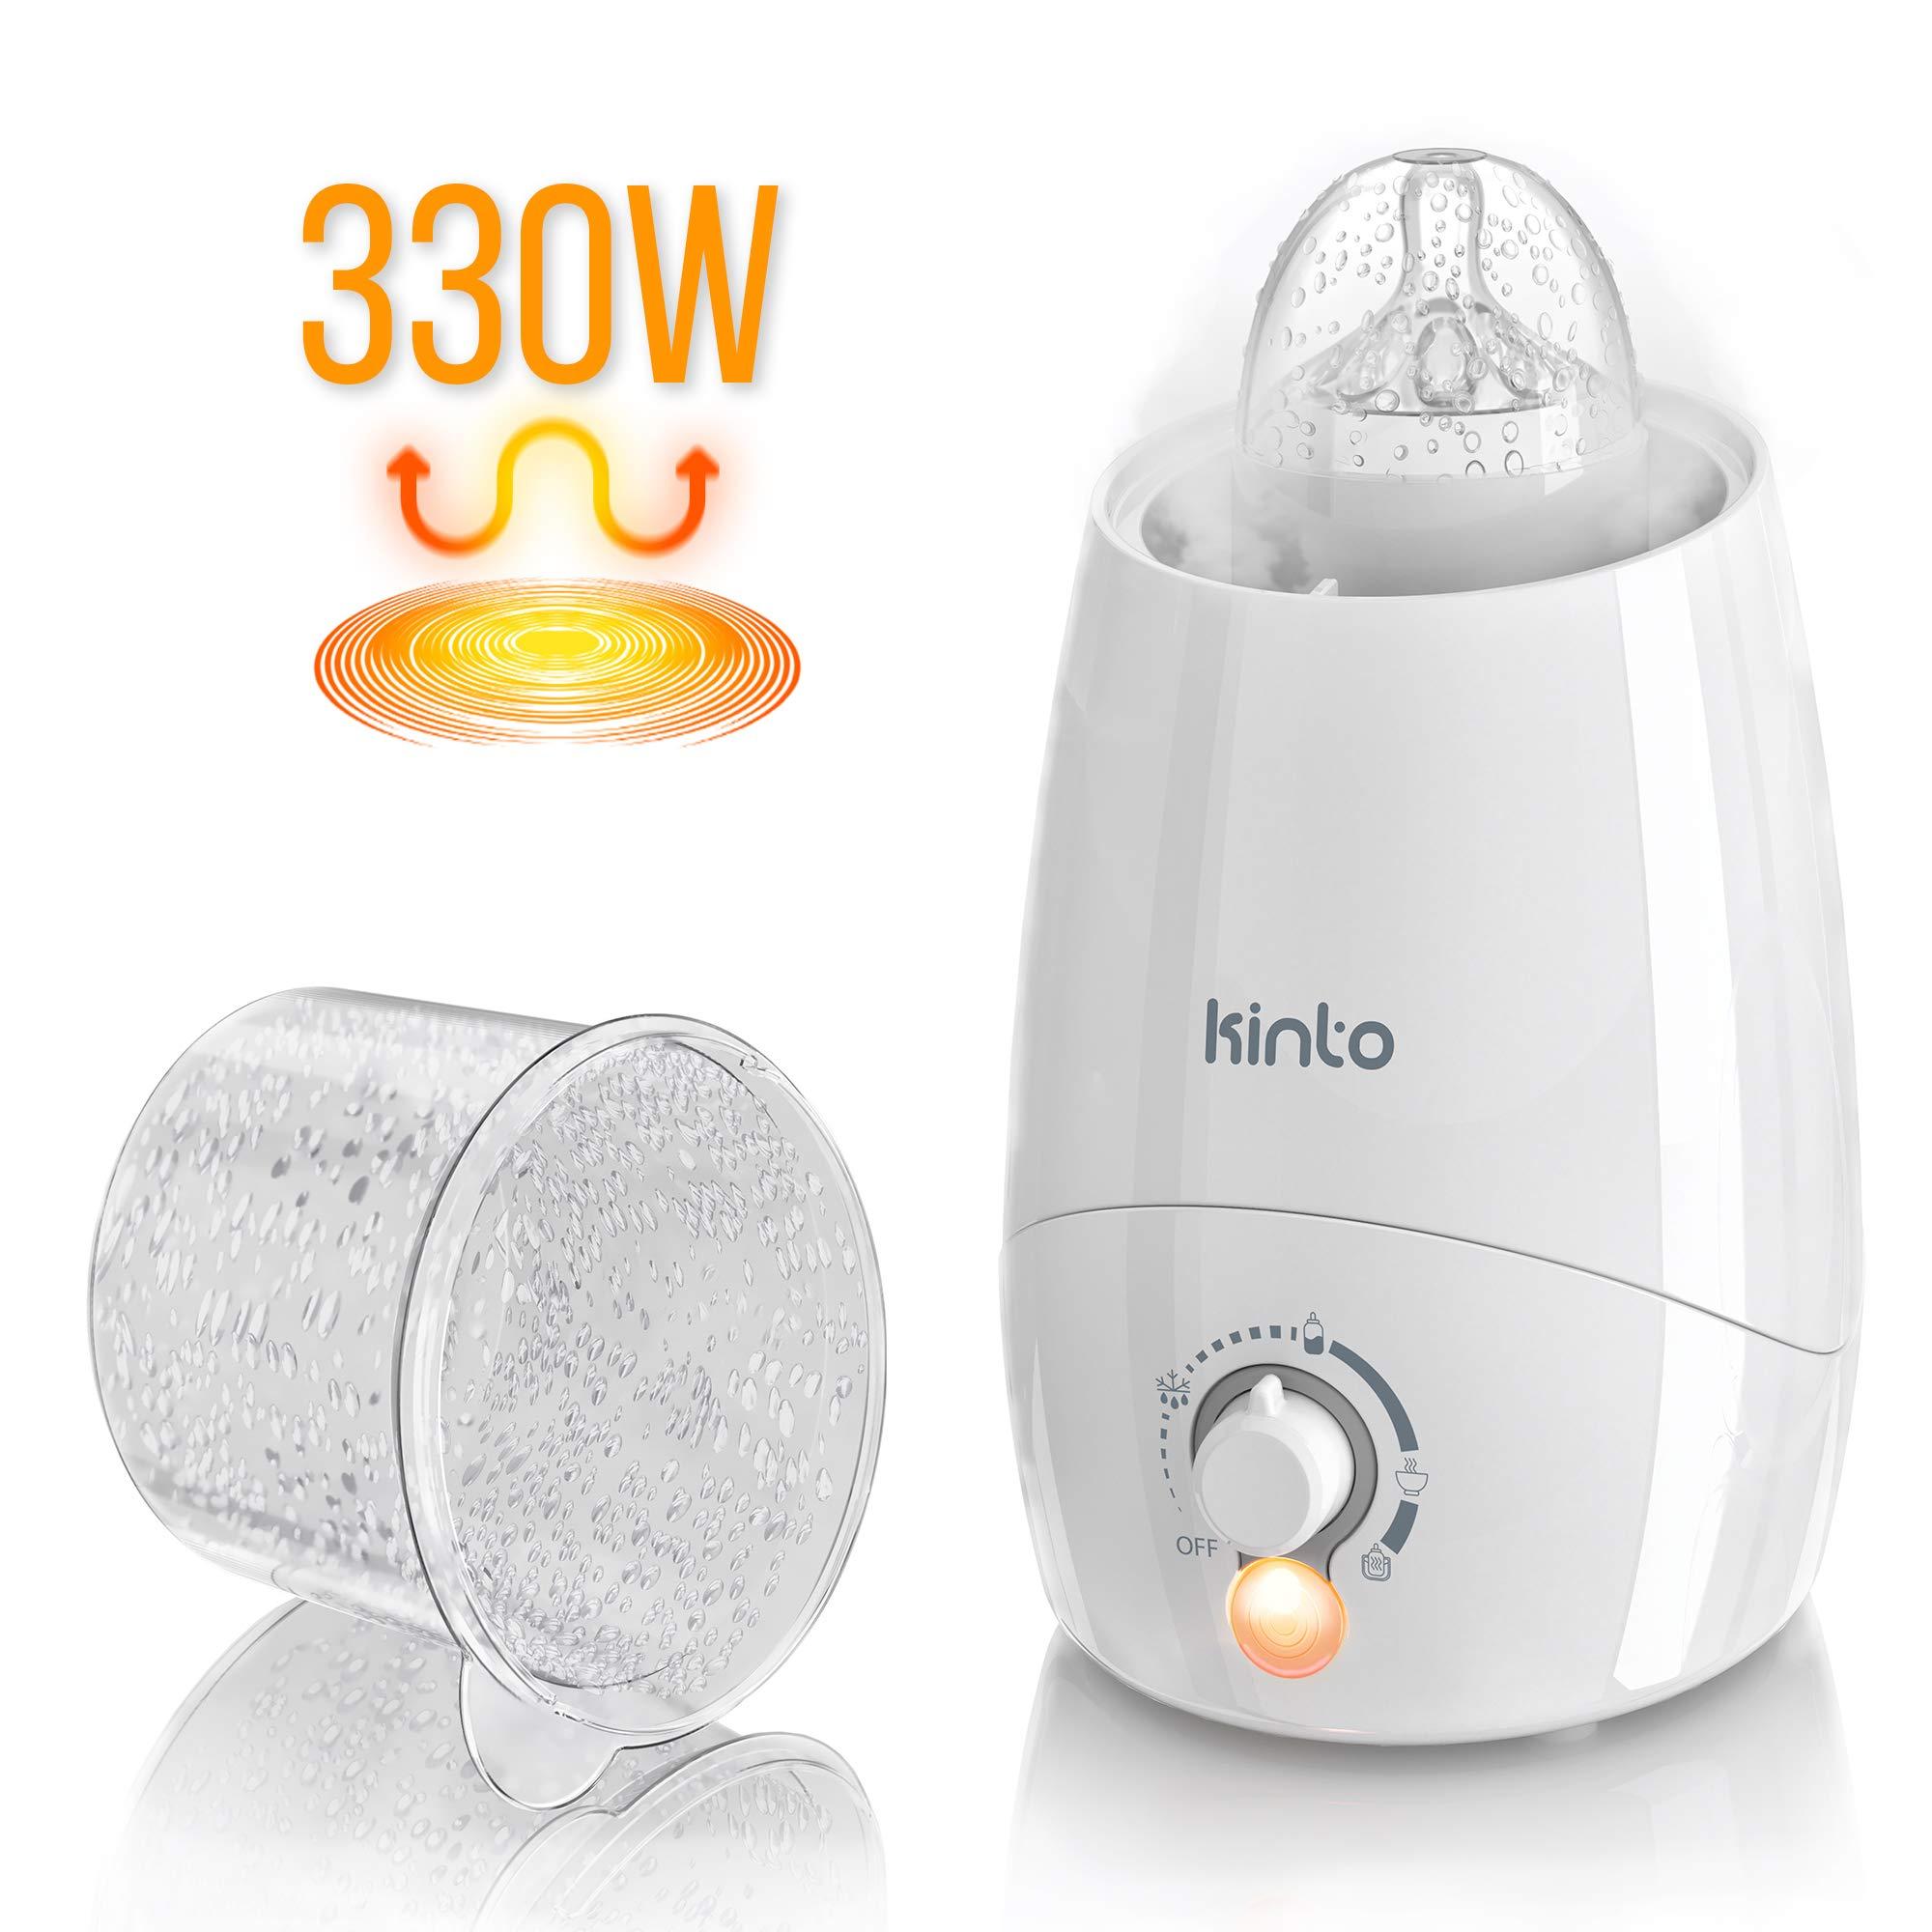 Fast Bottle Warmer for Breastmilk and Sterilizer - 4-in-1 - Breast Milk Baby Electric Bottle Warmer Prime by Kinto Tech